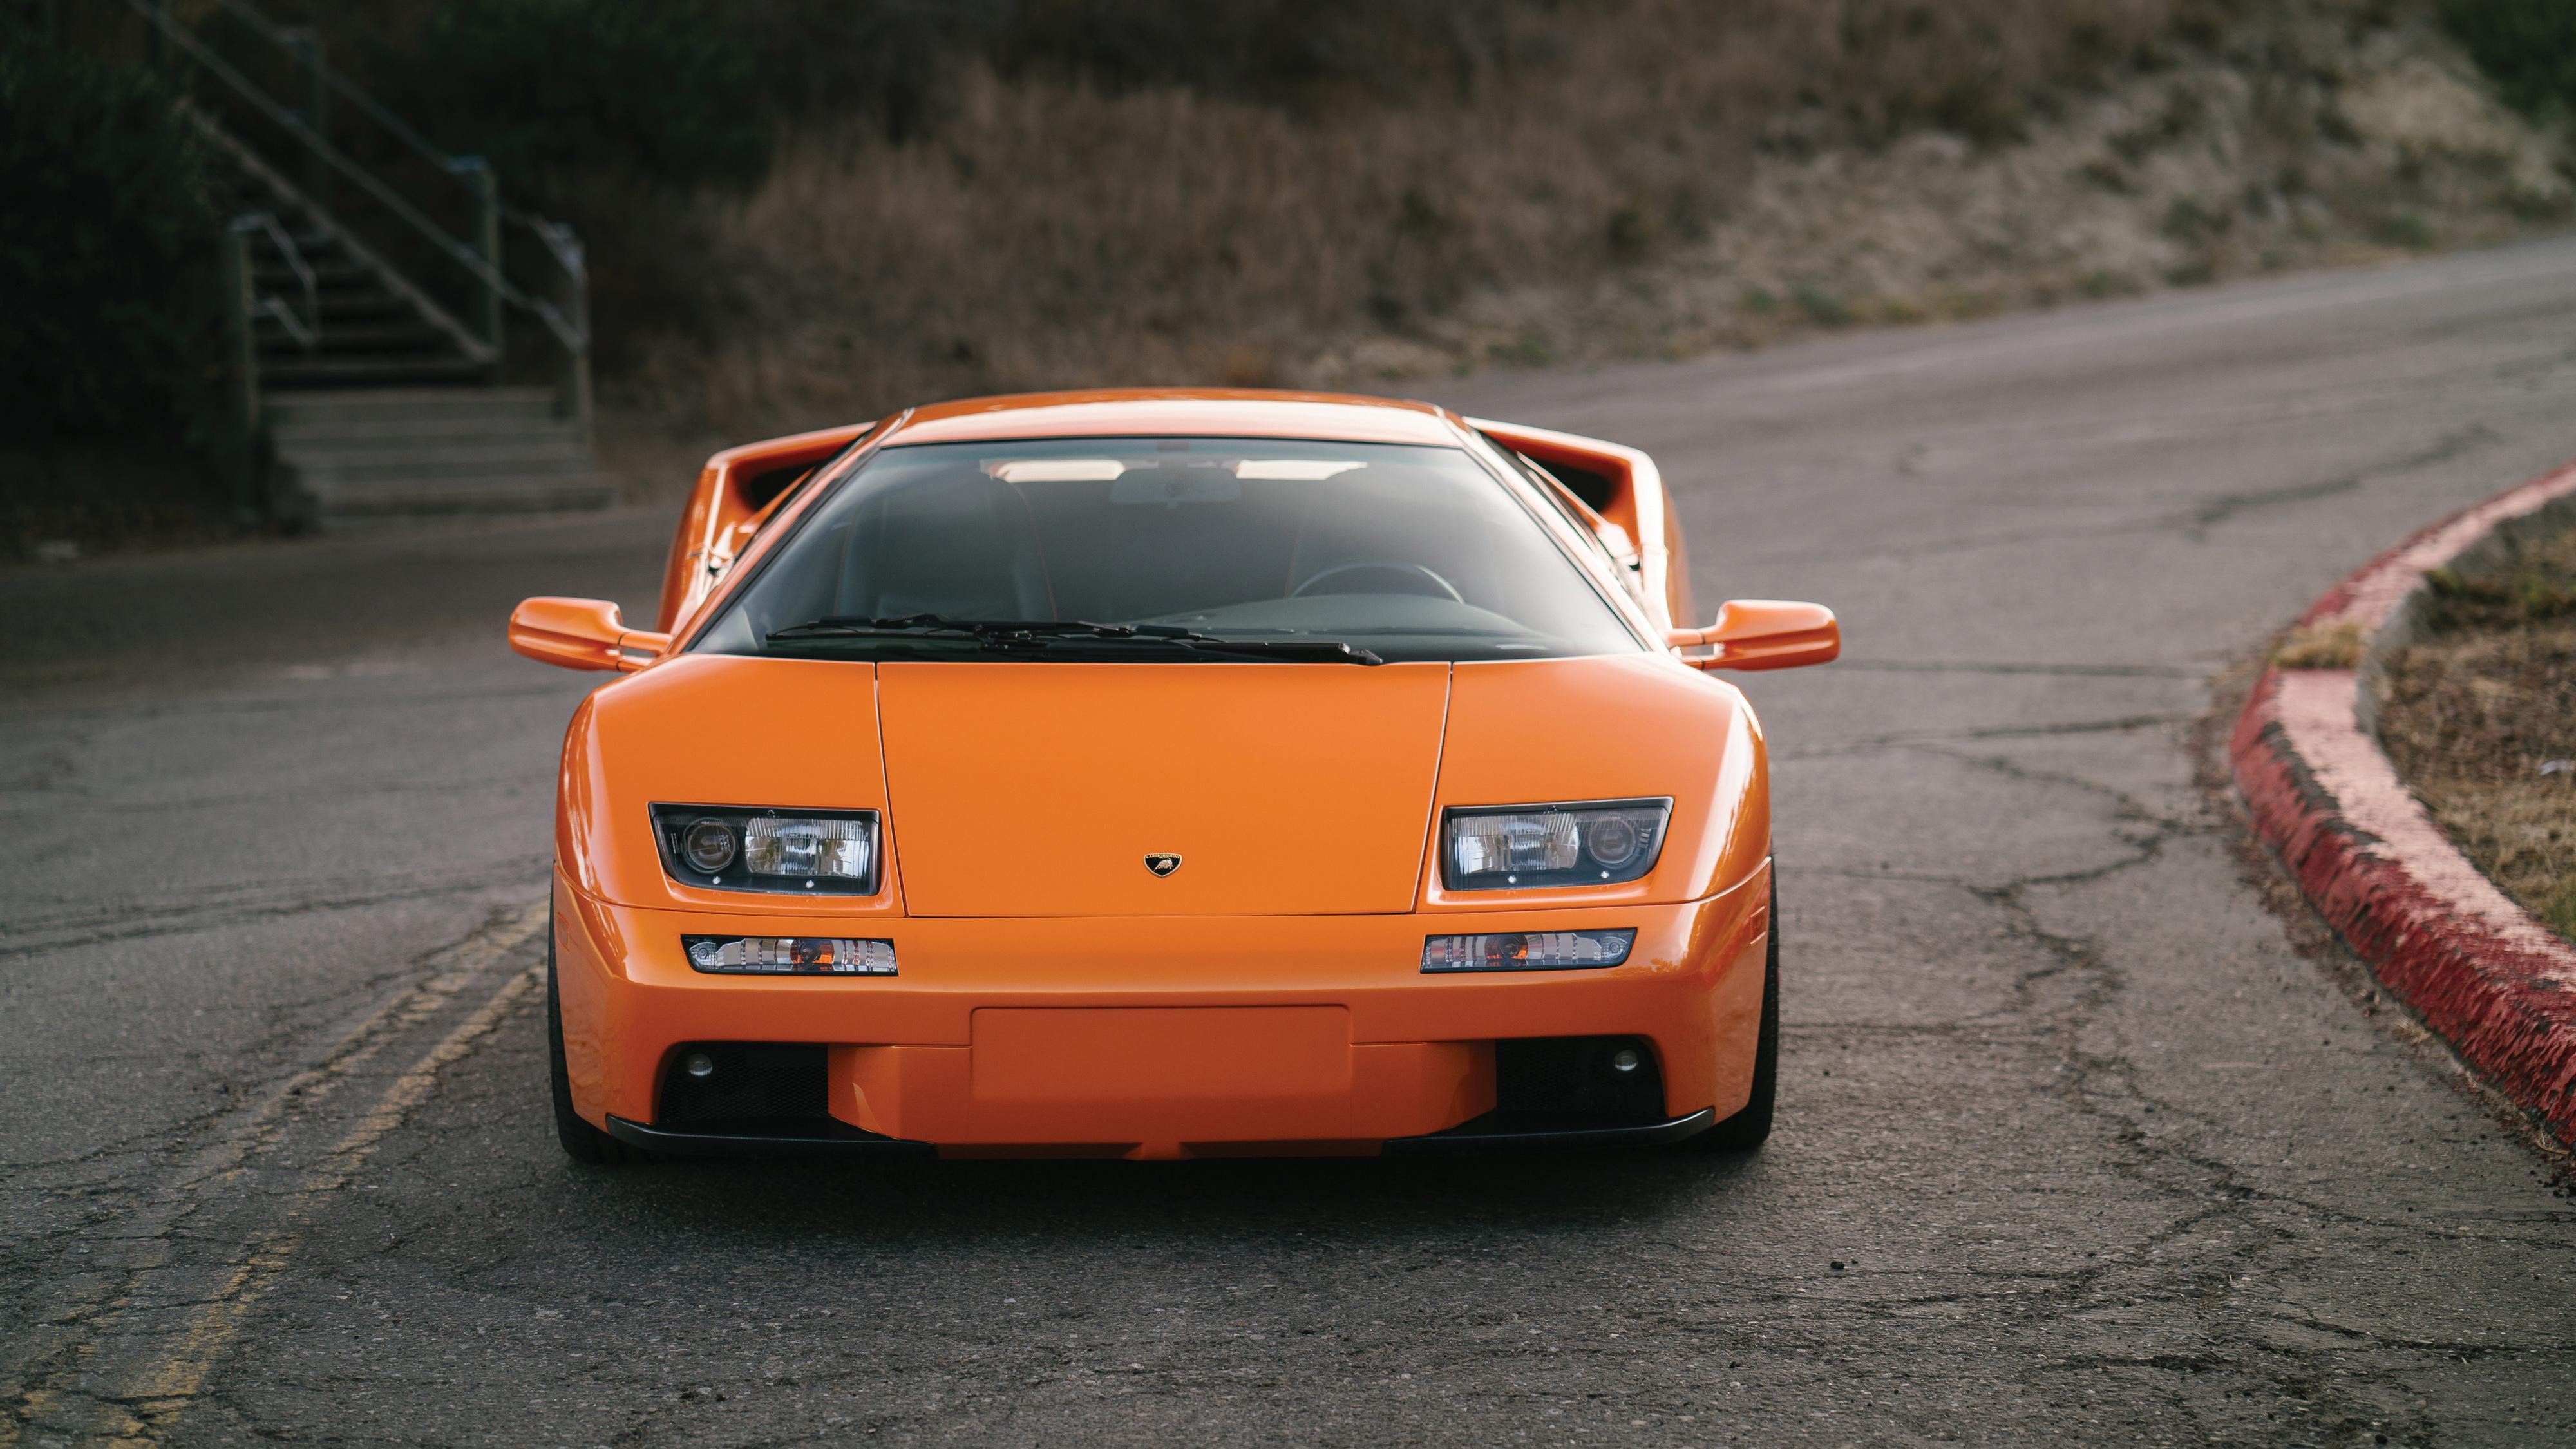 Lamborghini Diablo VT 6 4K Wallpaper | HD Car Wallpapers ...